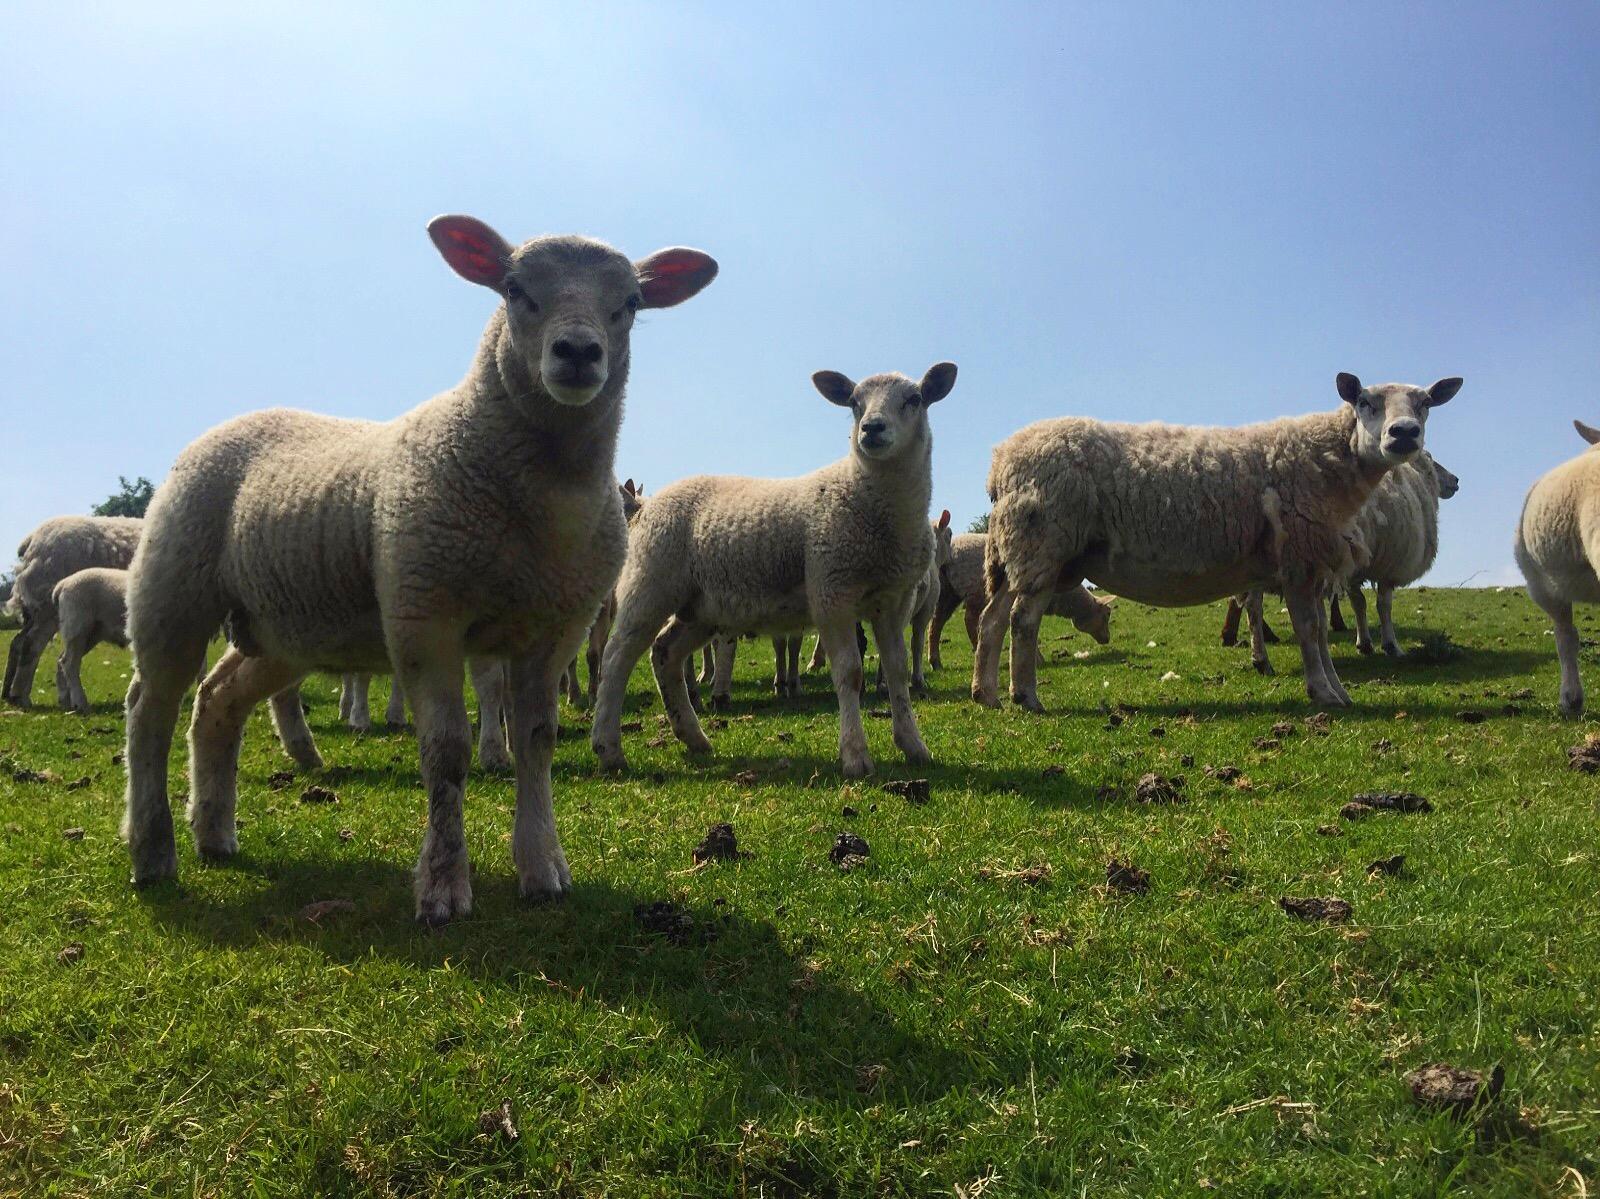 2_sheep_kilkeel_road_silent_valley_spelga_damn_mourne_mountains_ni_explorer_niexplorer_northern_ireland_blog.jpg